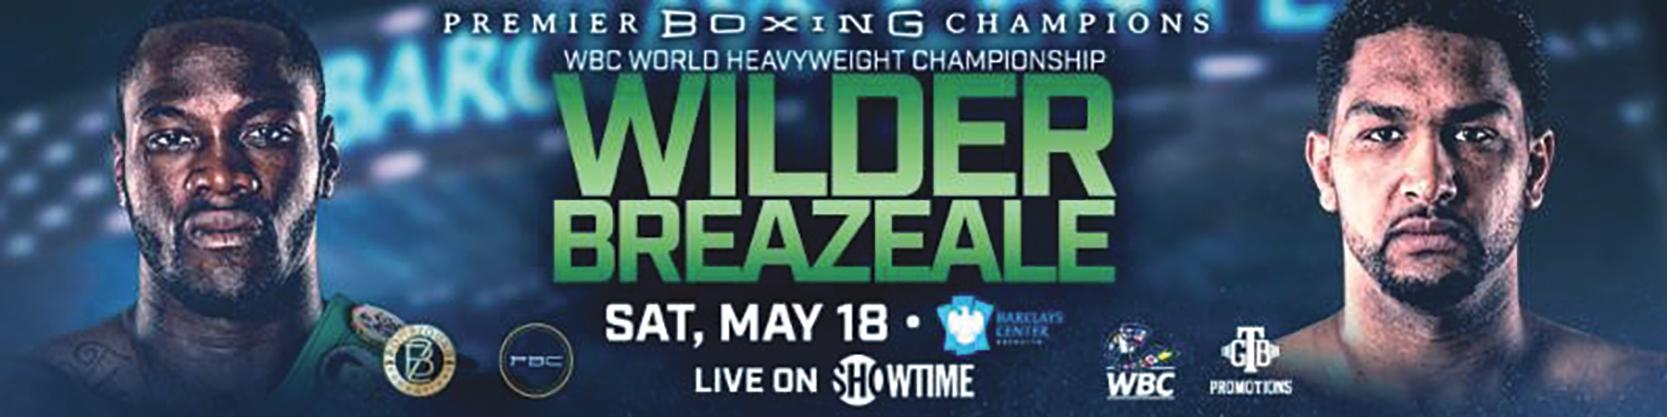 Wilder vs Breazeale Saturday May 18th pic.jpg